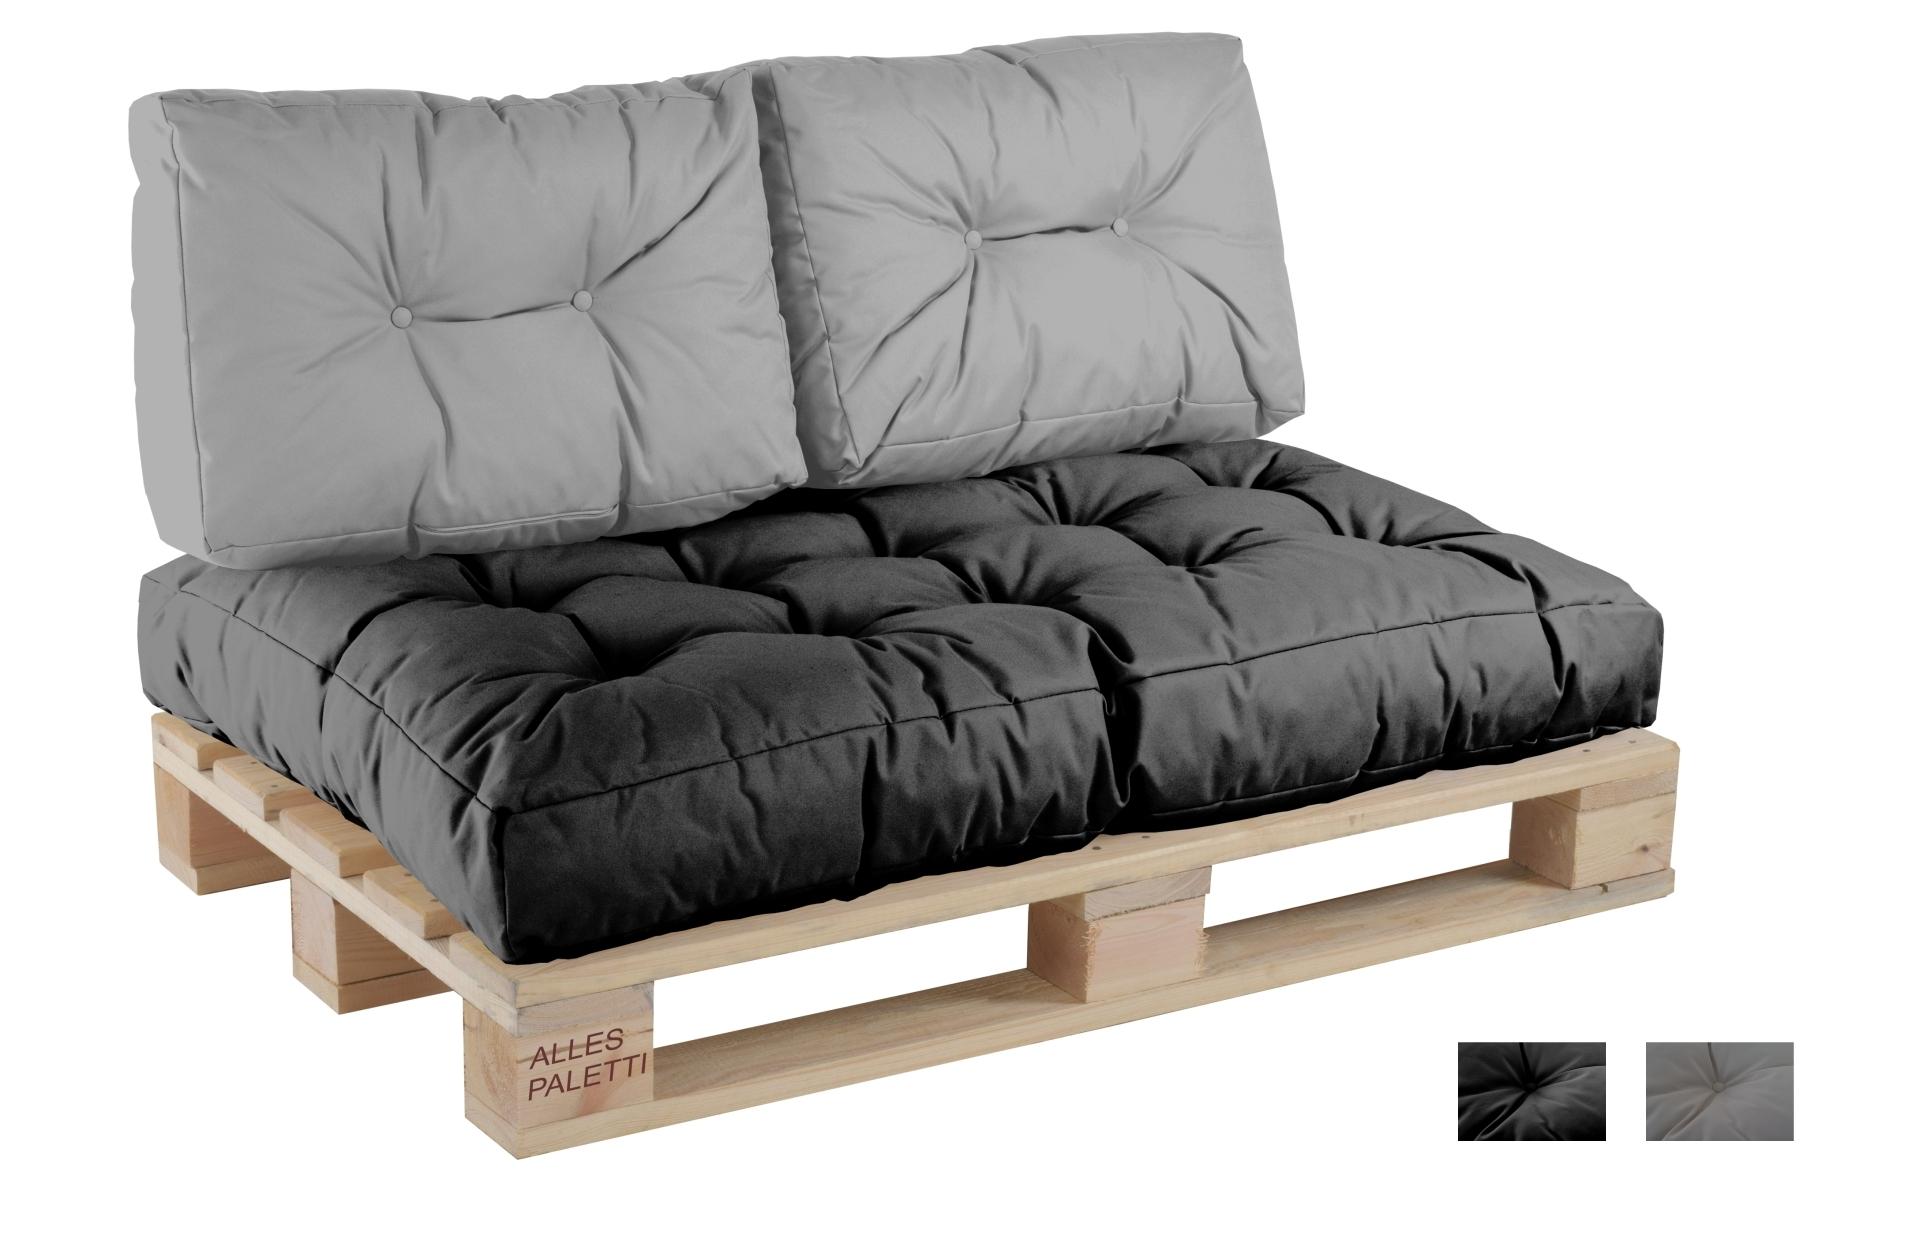 Matratzen sofa  Euro-Palettenkissen Indoor/Outdoor ALLESPALETTI - Vita-line